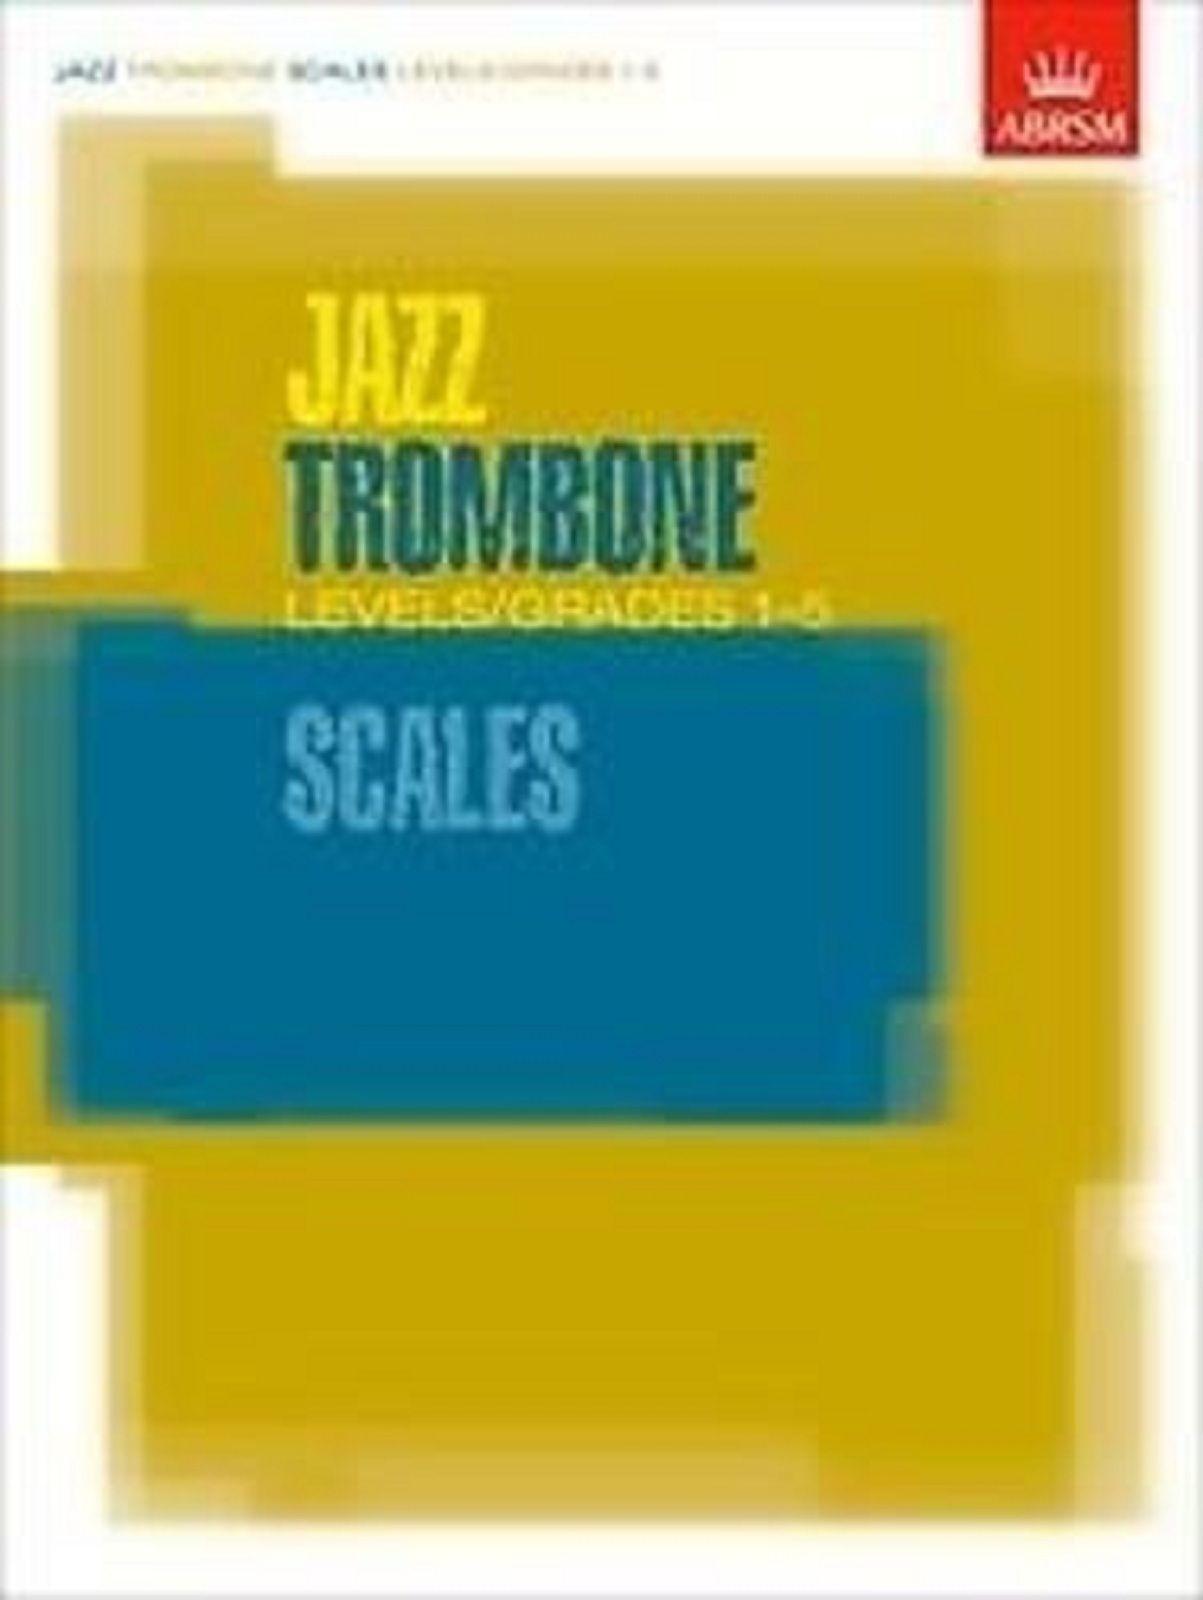 Jazz Trombone Scales Levels / Grades 1-5 Beginners Sheet Music Book ABRSM S154